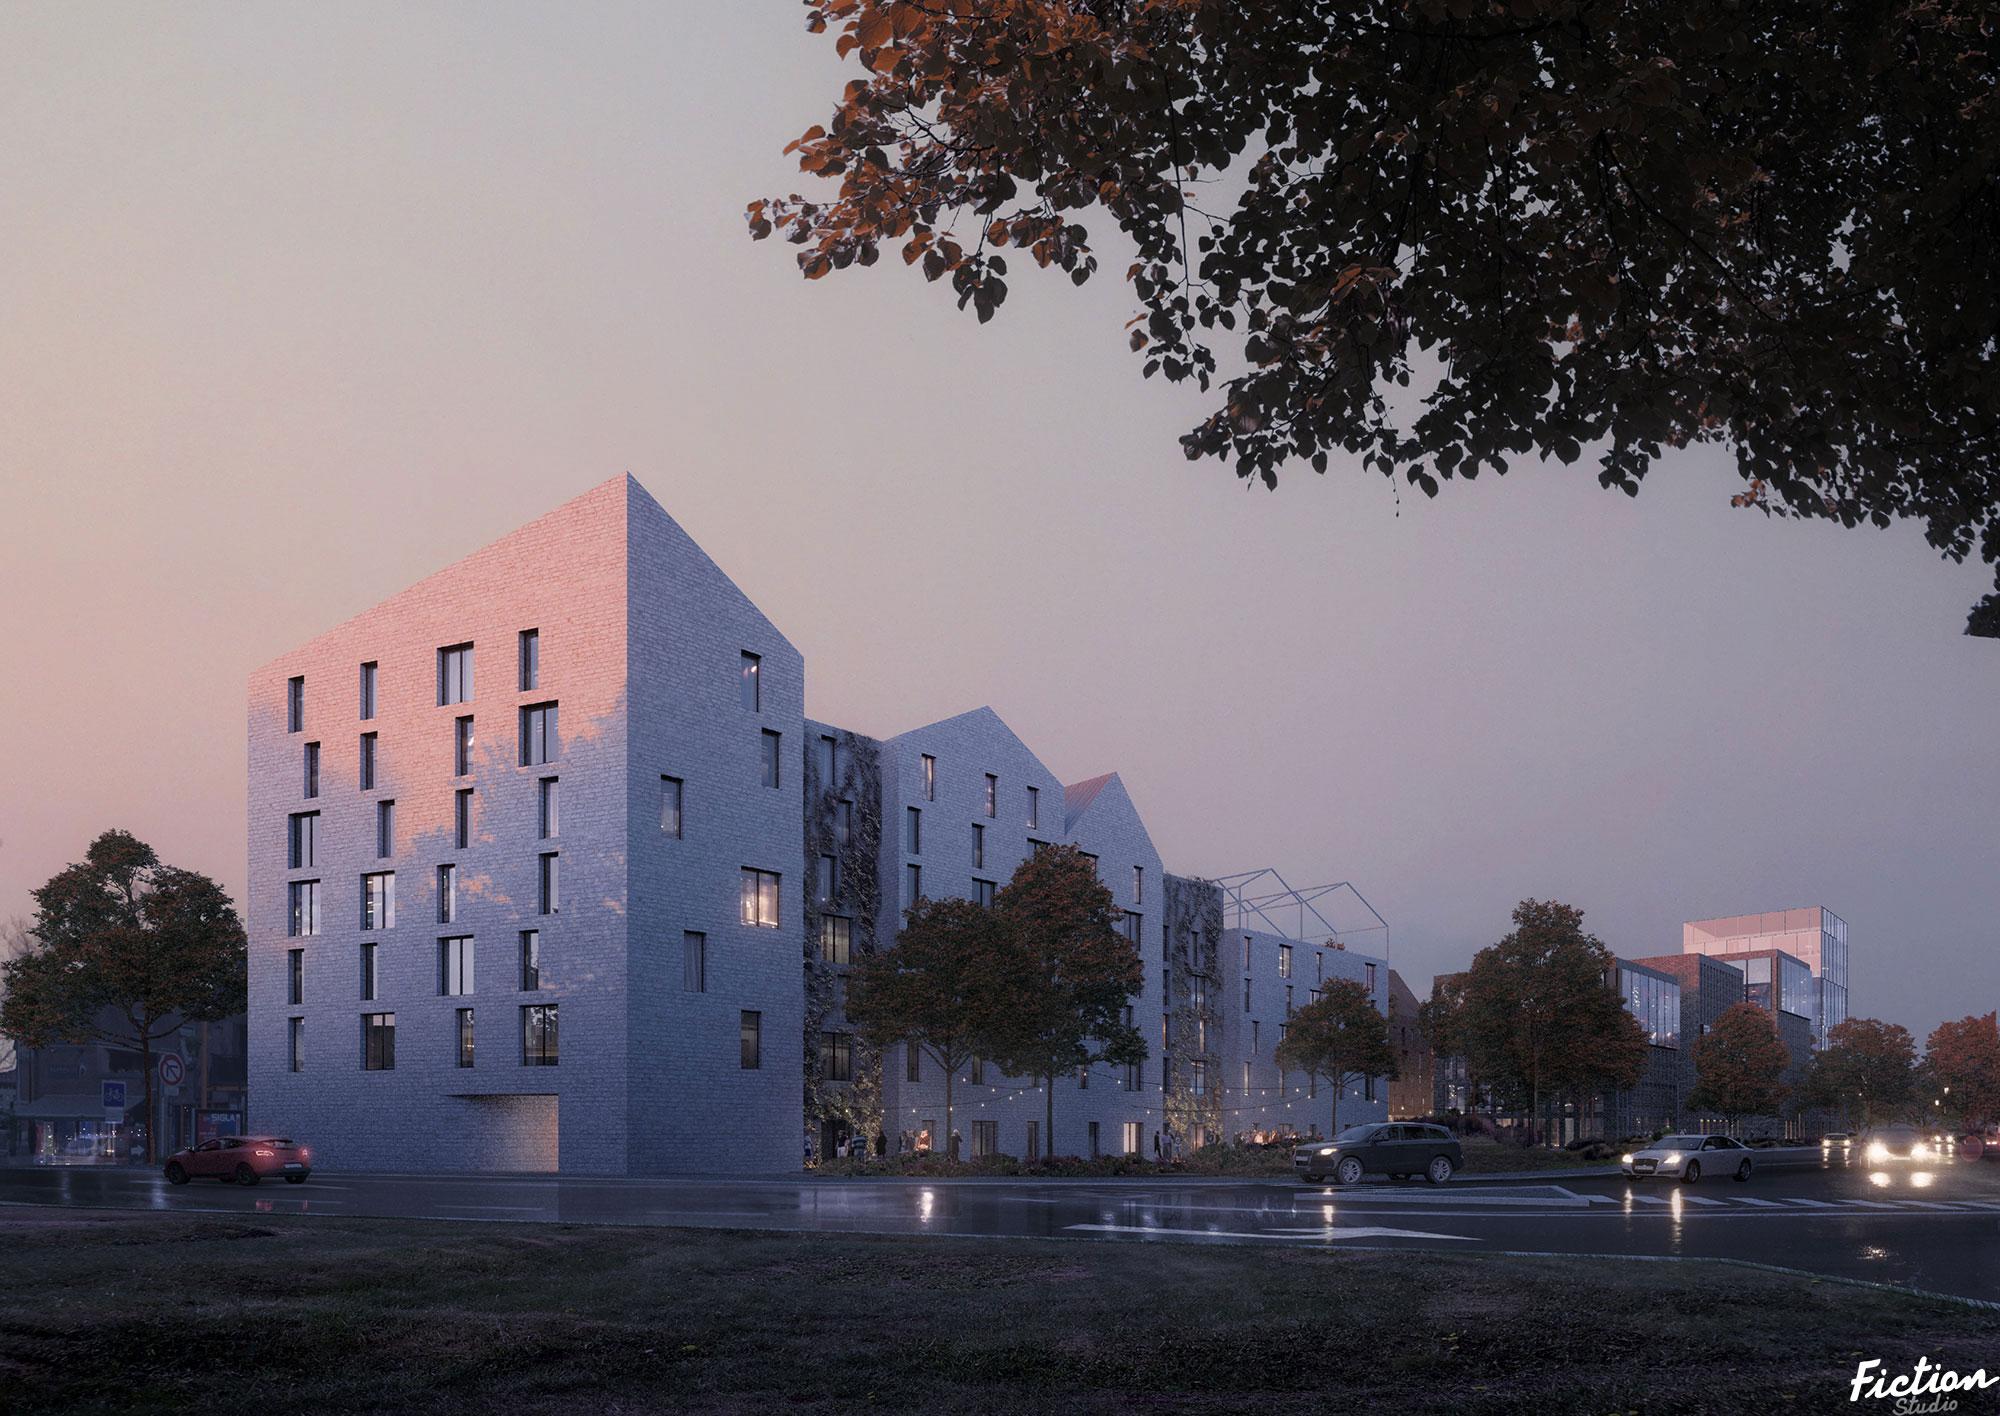 Artbuild - Madeleine - France